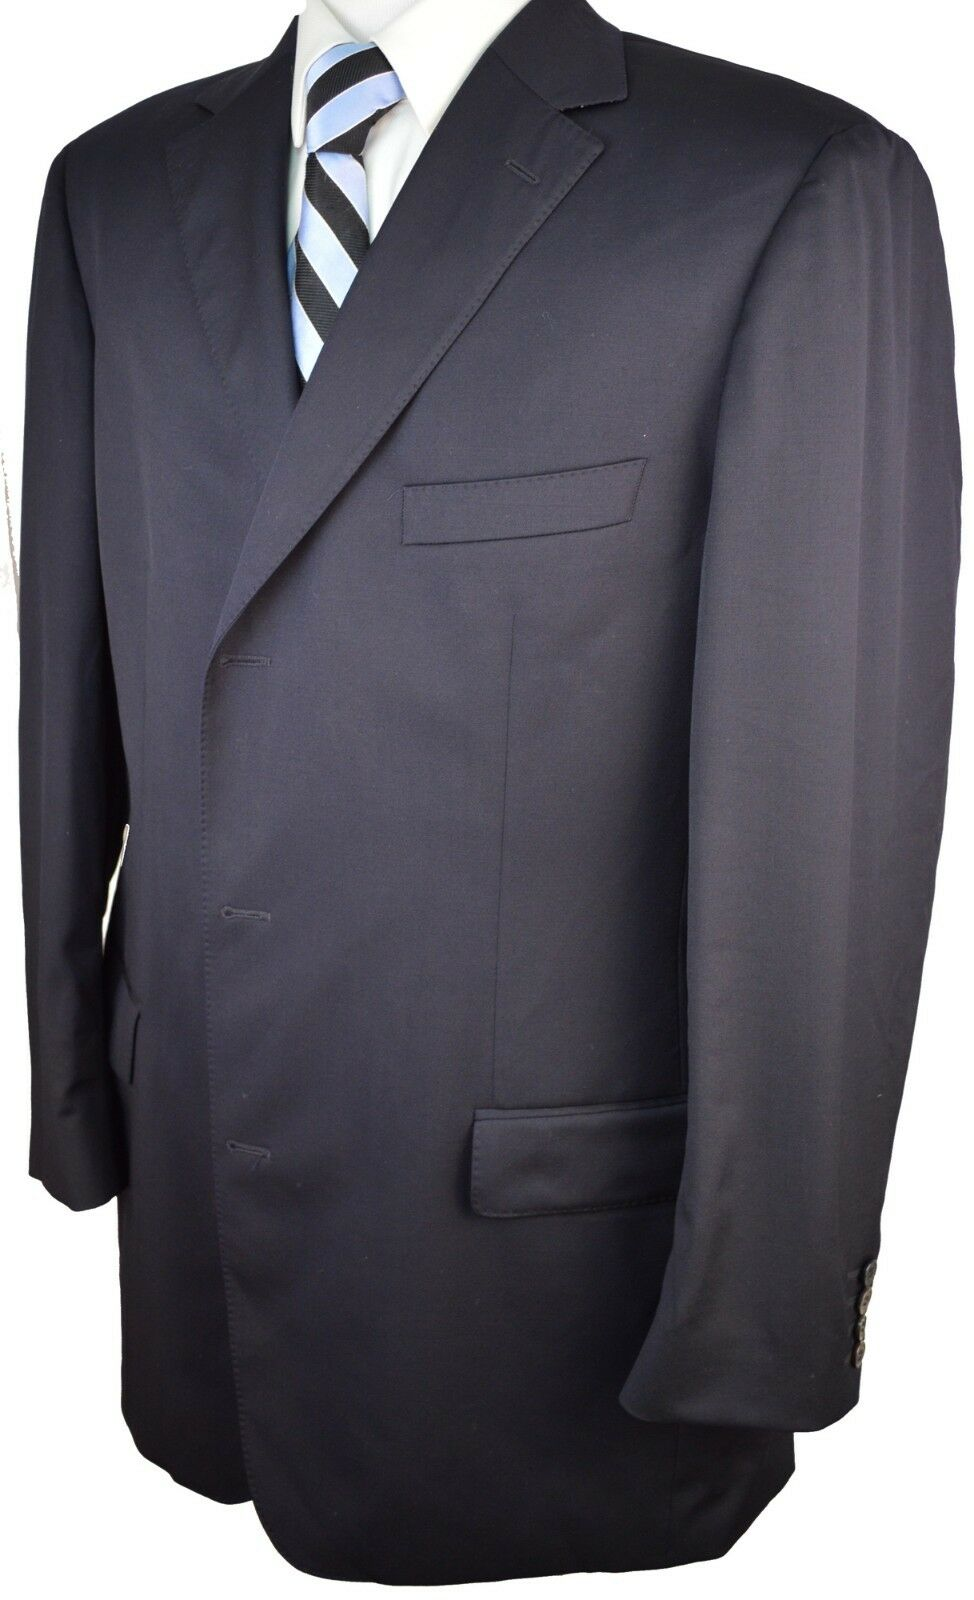 BZ47 HUGO BOSS Scorsese US Navy Blau 100% Wool Three Button Blazer 46 Long